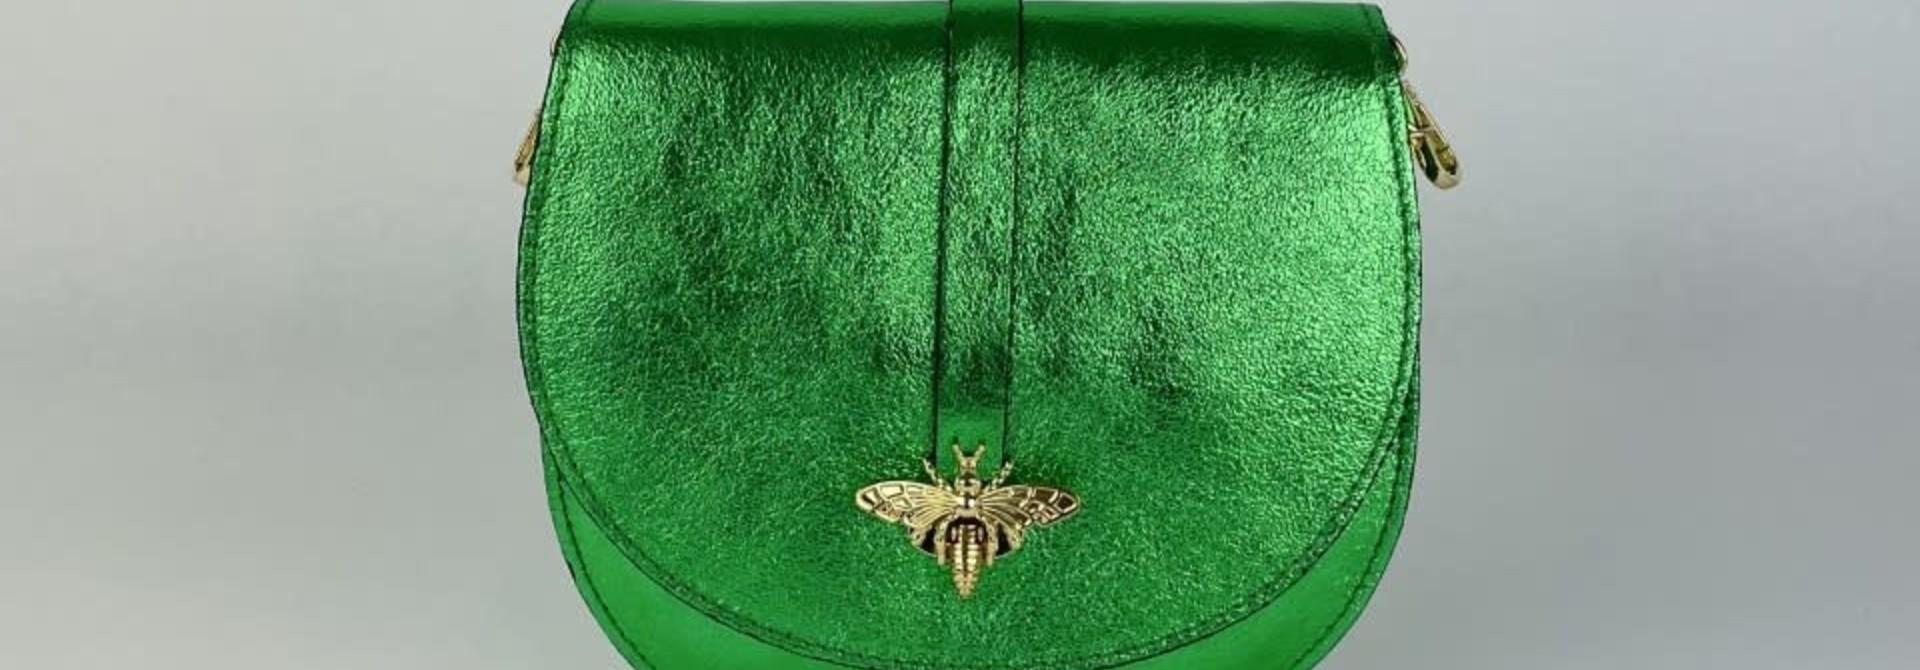 Xenna metalic calf leather dragonfly bag Green